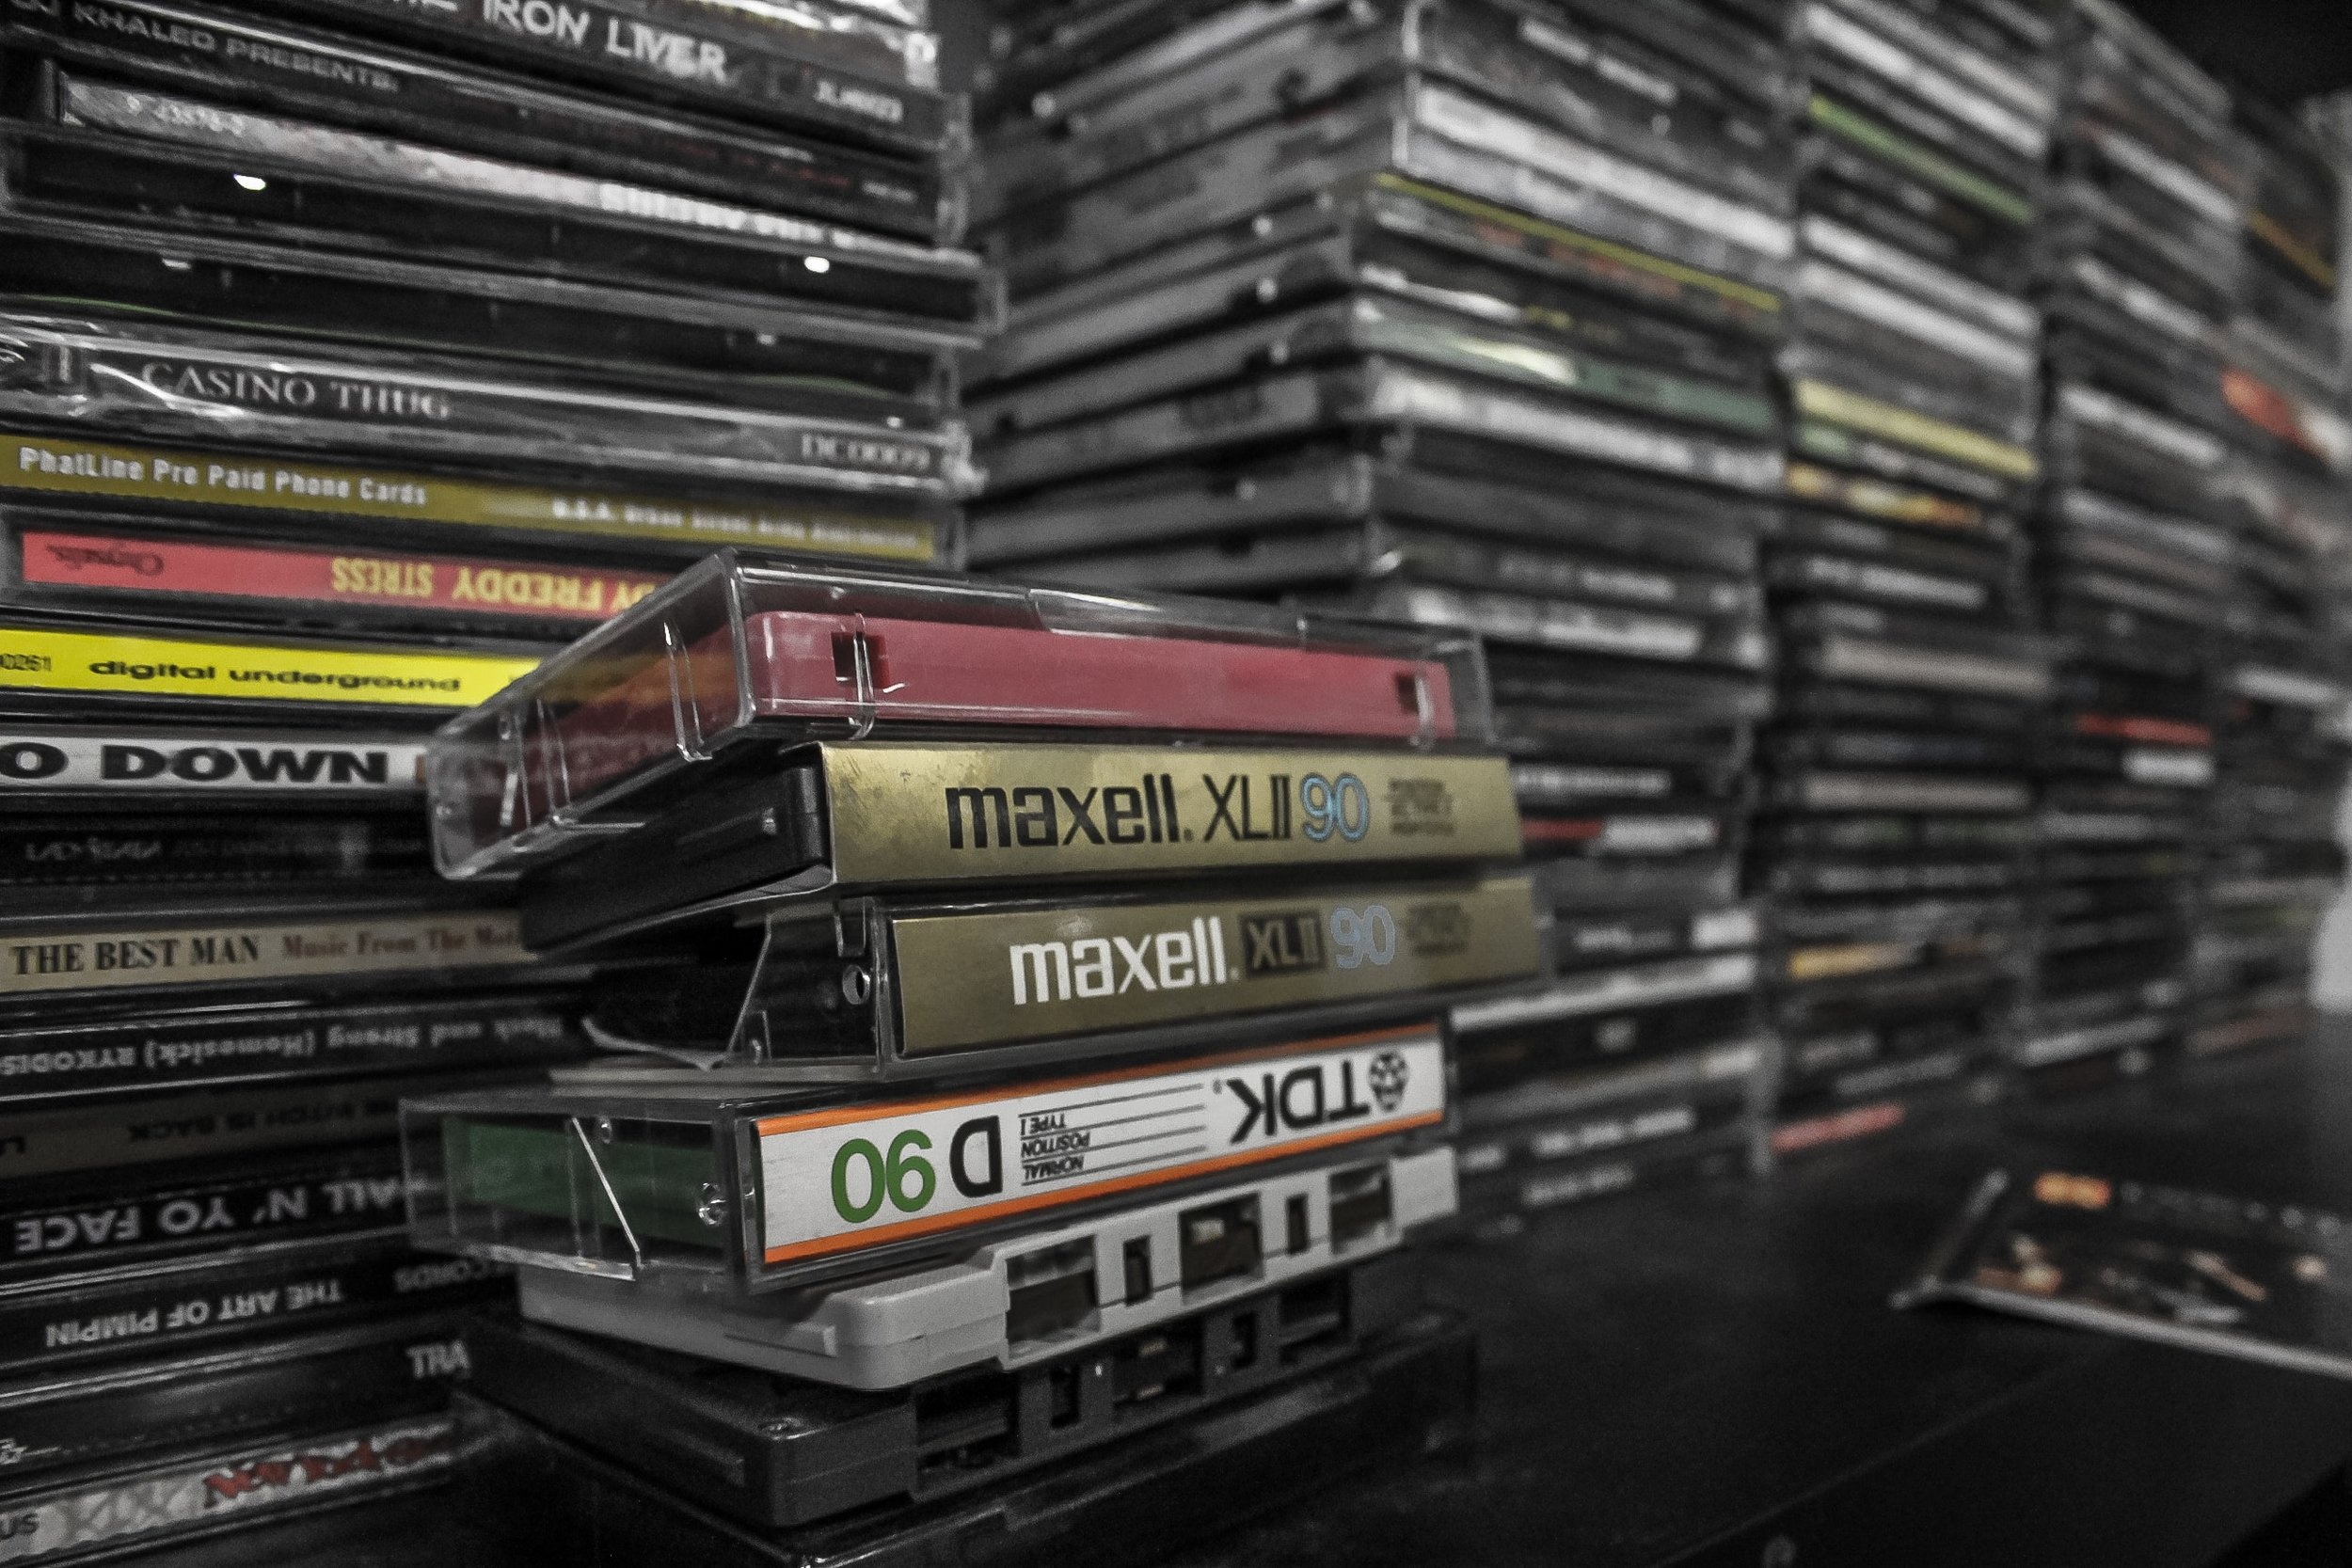 audio-cassettes-cds-11762.jpg